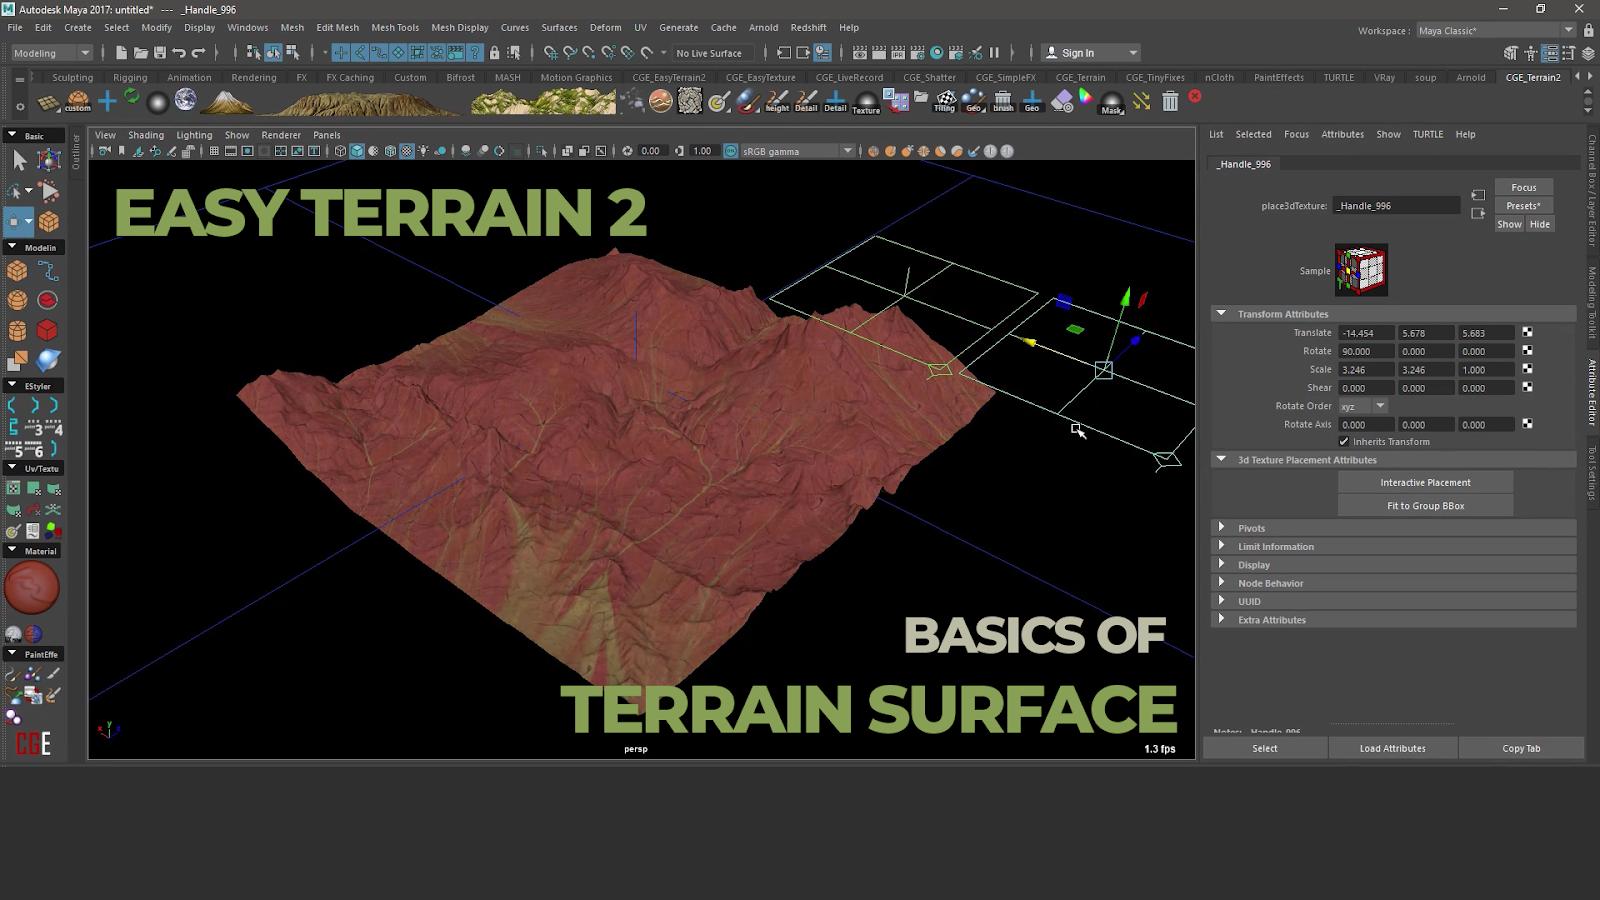 Basics of Terrain Surface in EasyTerrain 2 | CG TUTORIAL